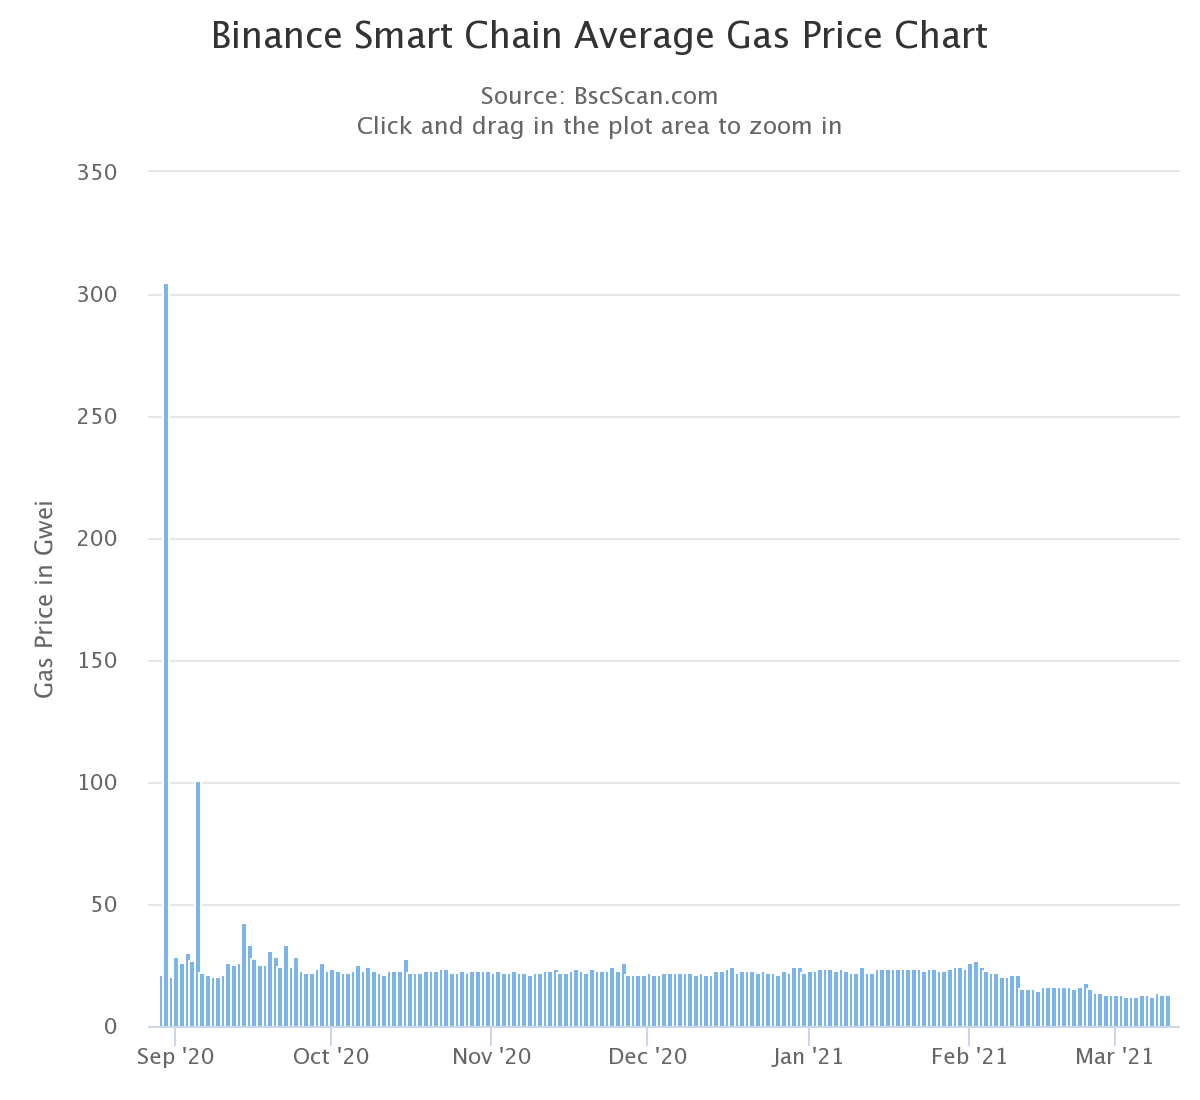 Динамика средней цены газа в сети Binance Smart Chain.